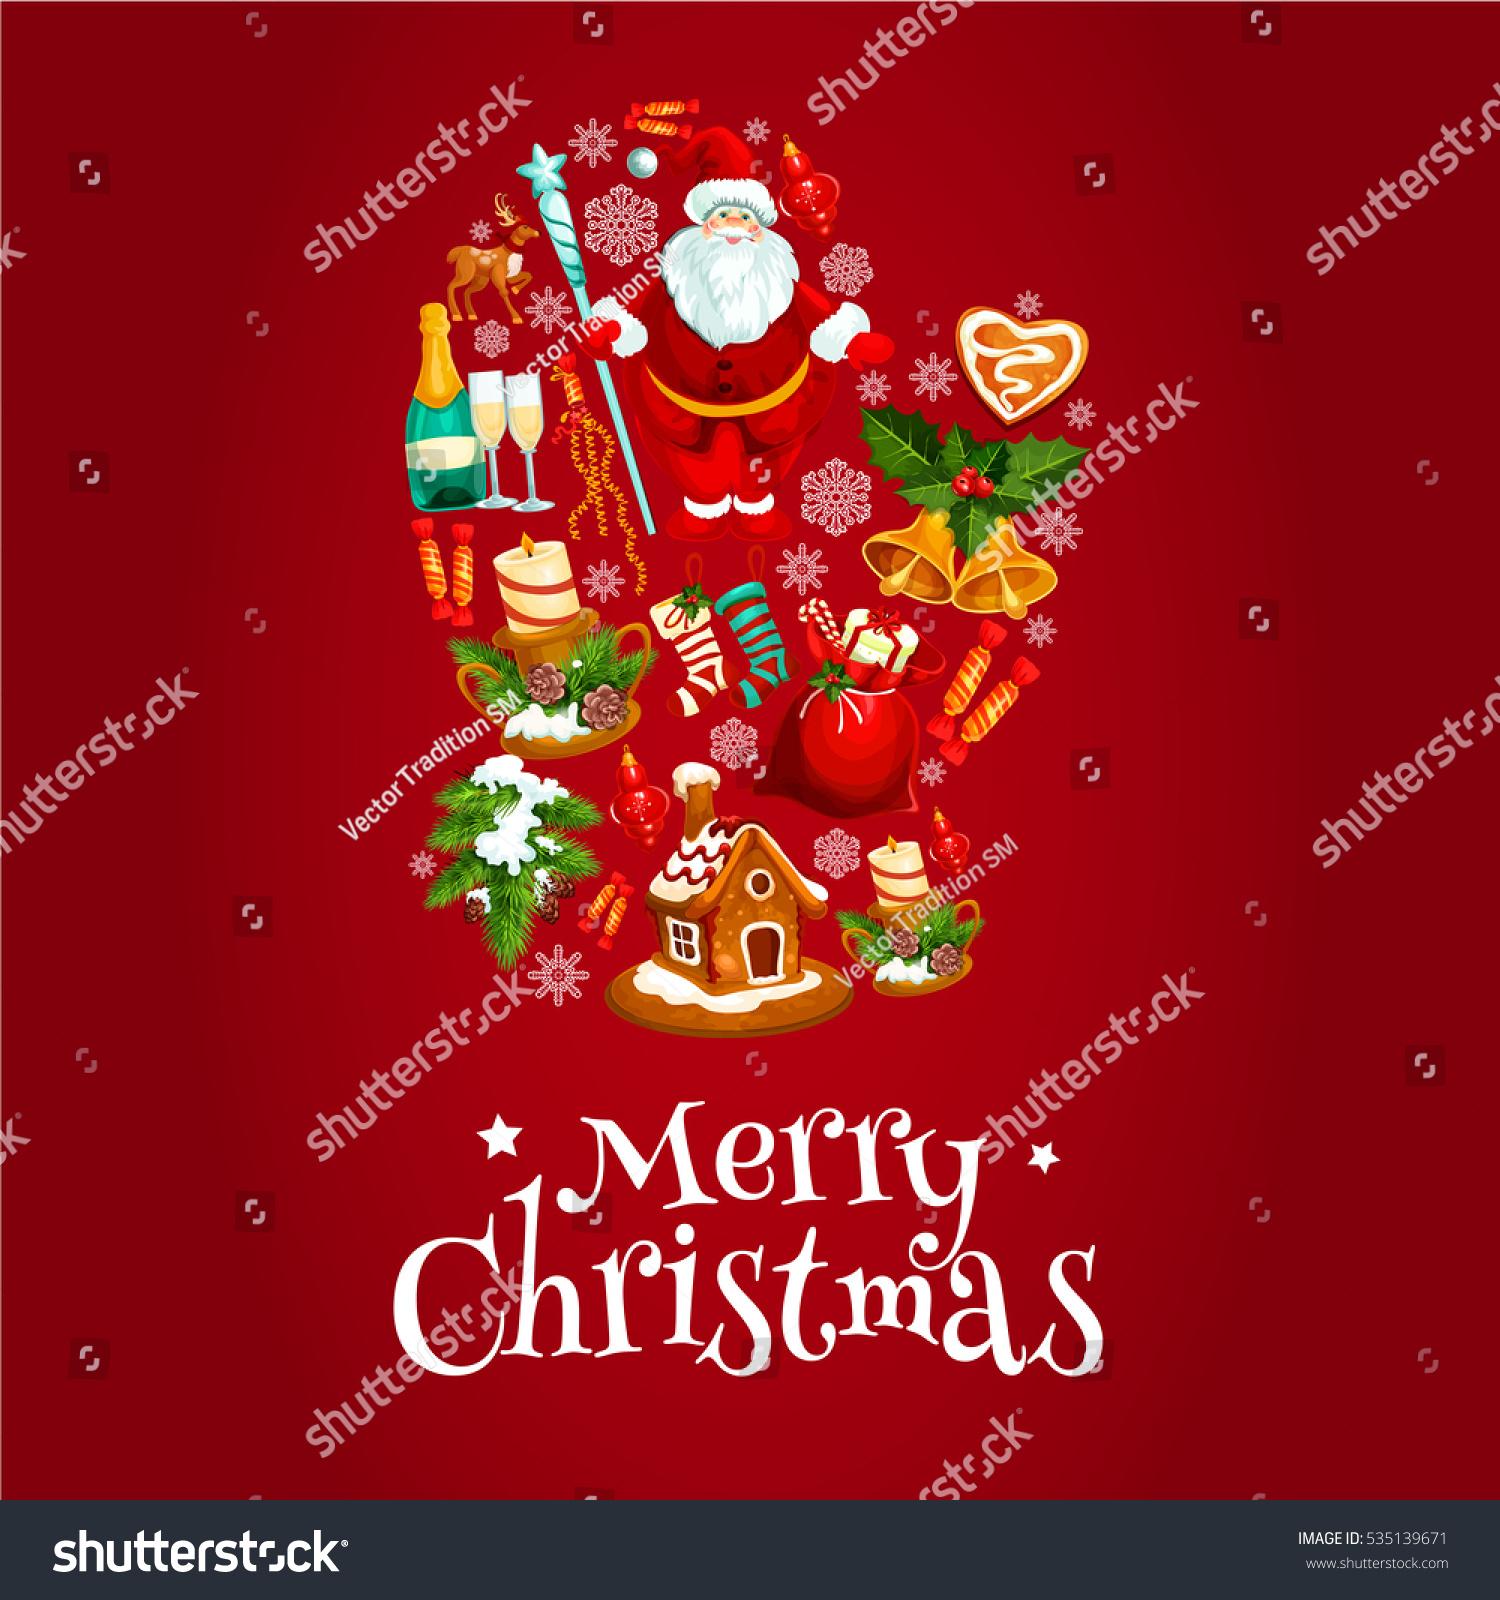 Christmas Card Mitten Gift Bag Santa Stock Illustration 535139671 ...